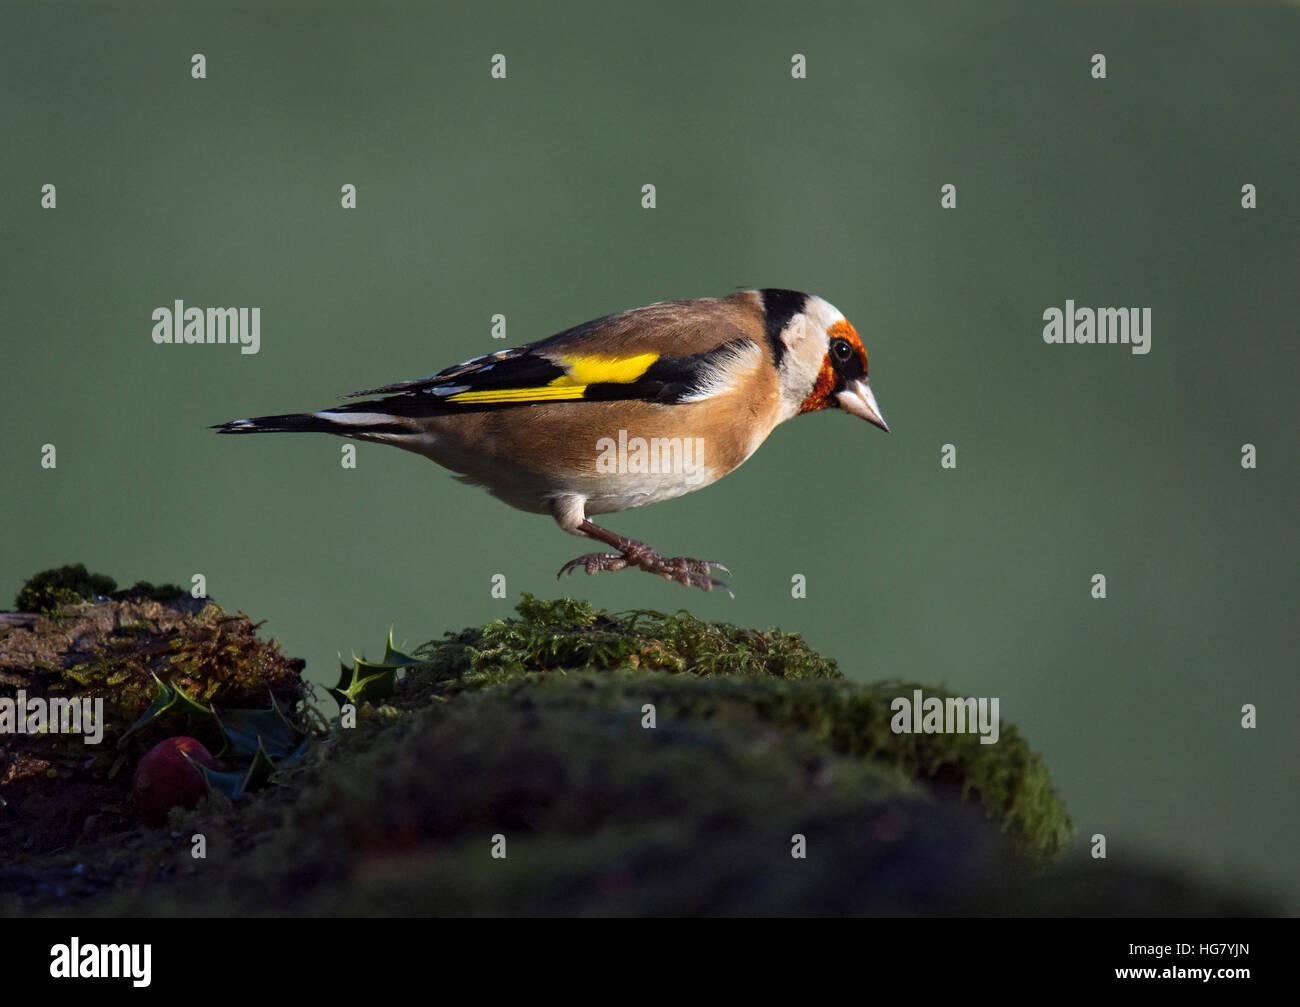 Goldfinch, Carduelis carduelis, jumping on moss covered stone in Wareham, Dorset, England, UK Stock Photo